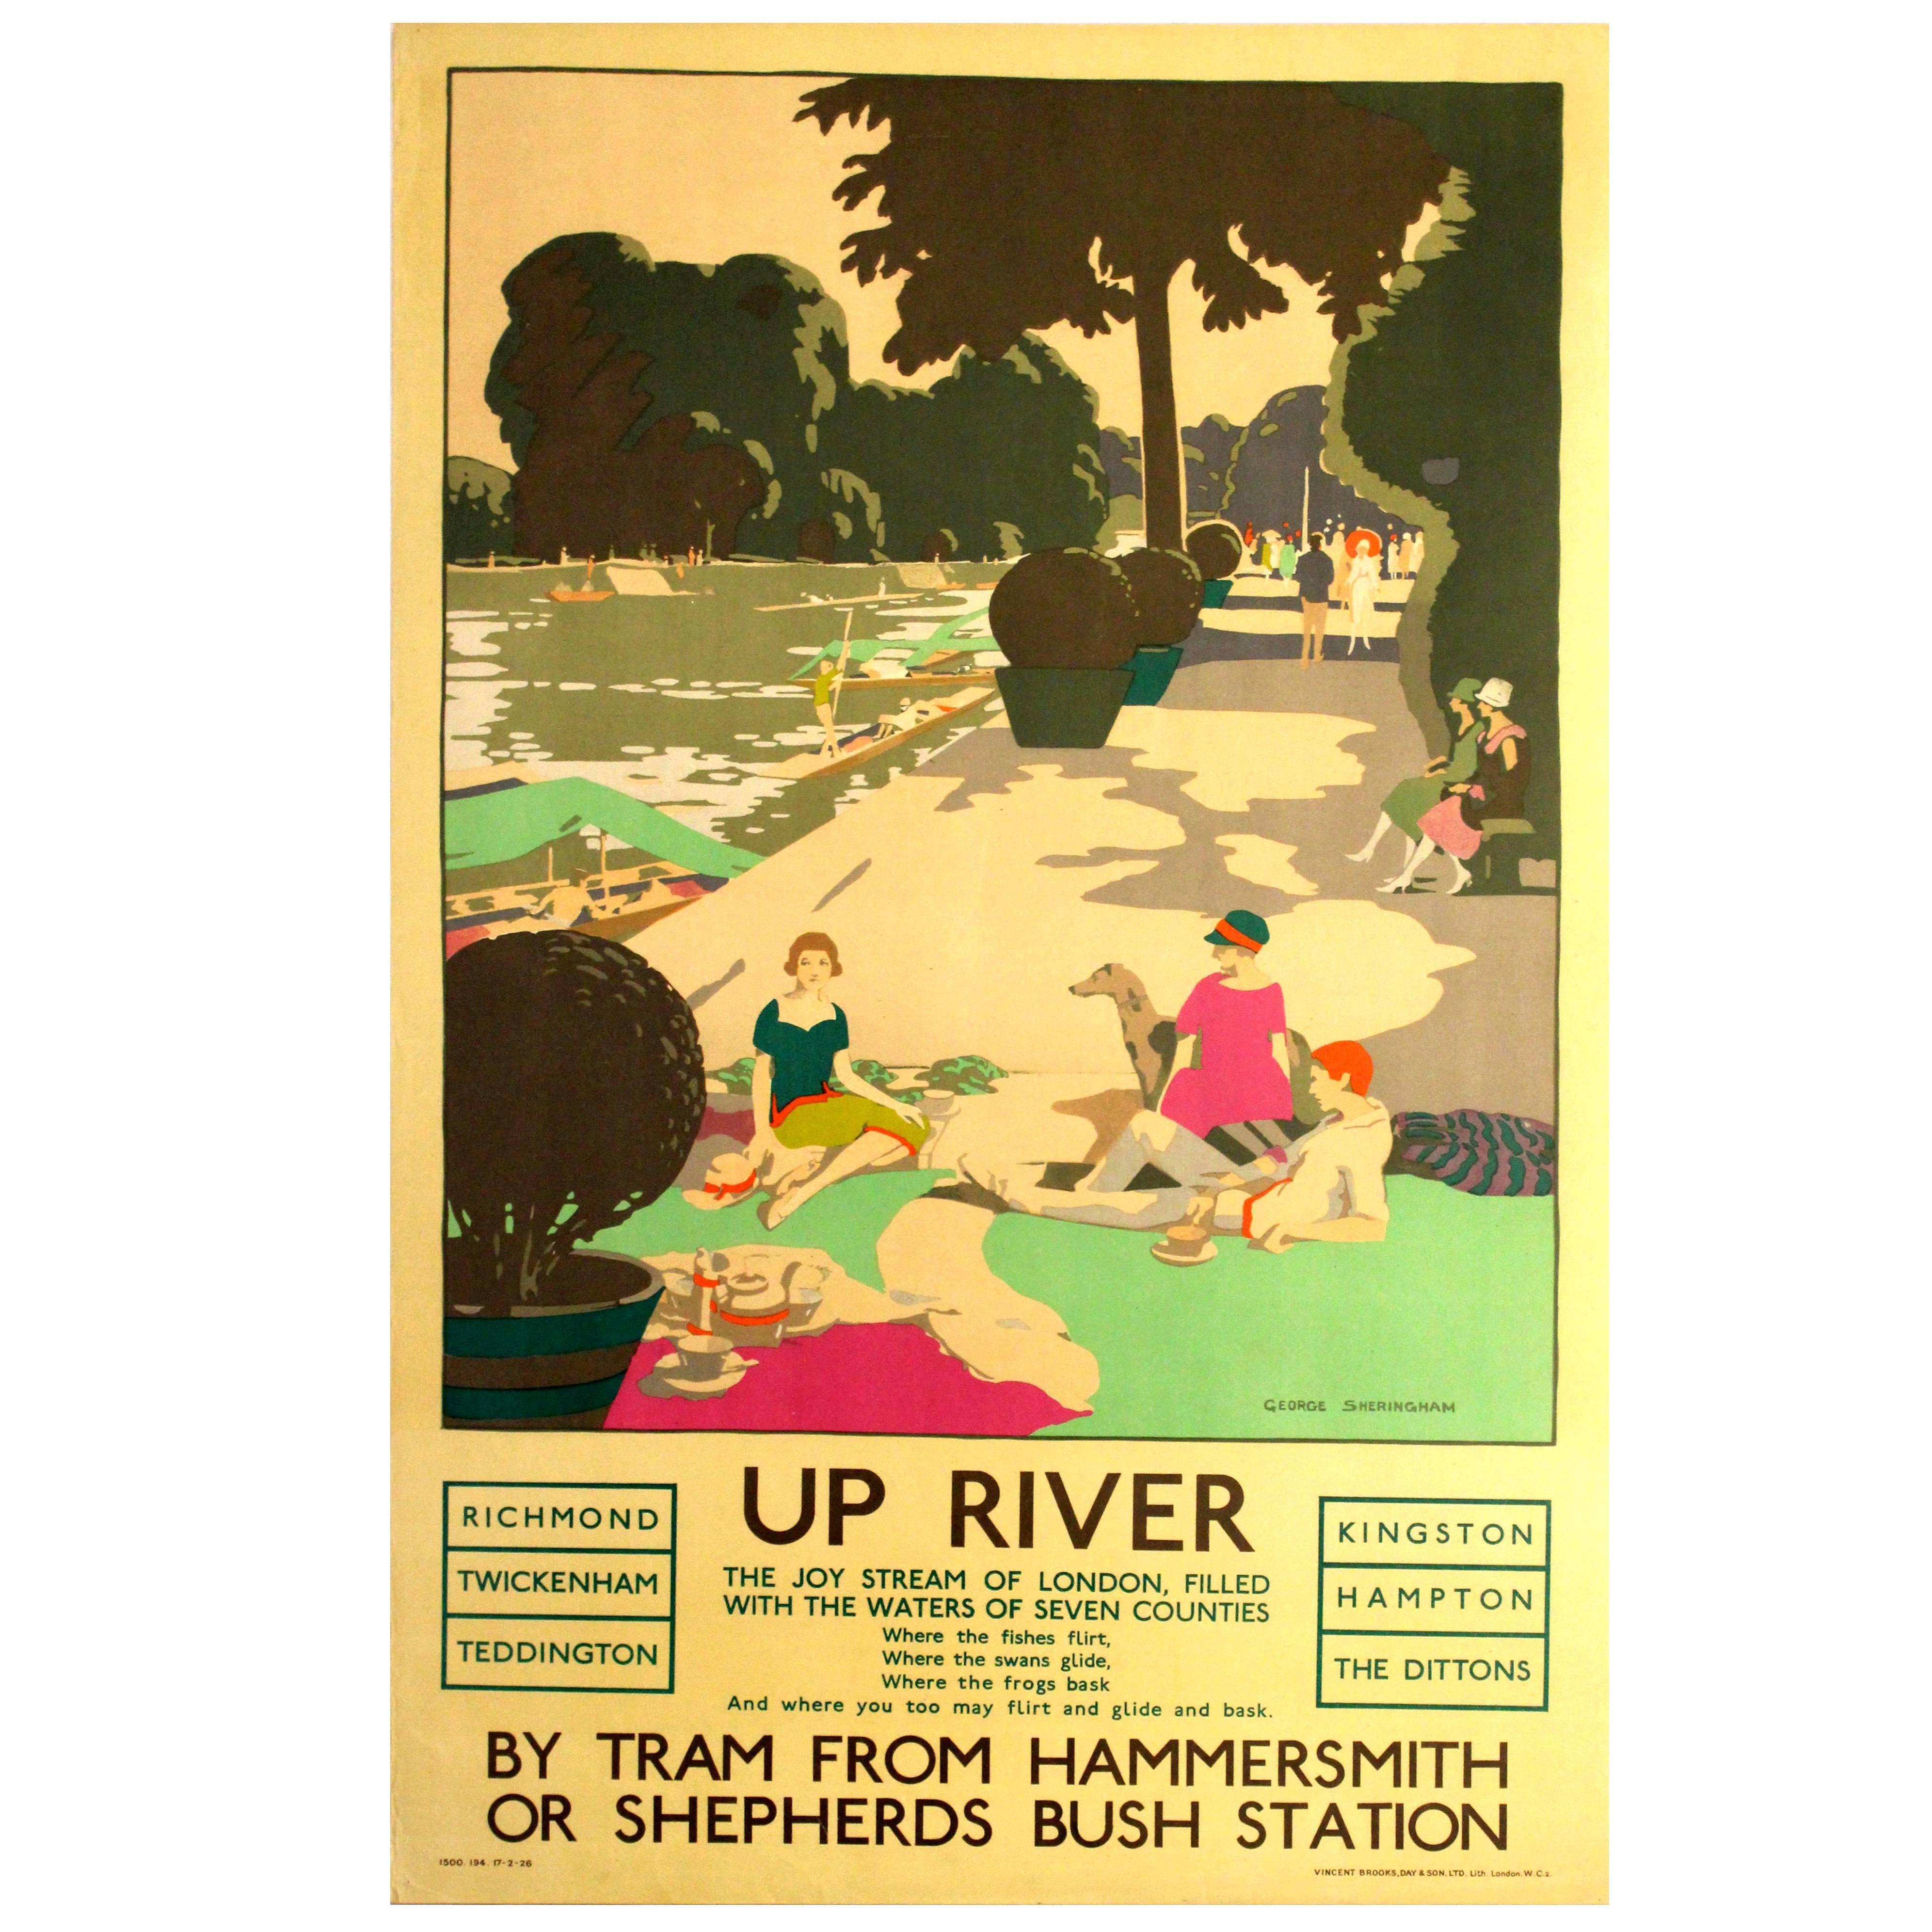 Original Vintage 1926 London Transport Poster Up River Thames Twickenham Hampton